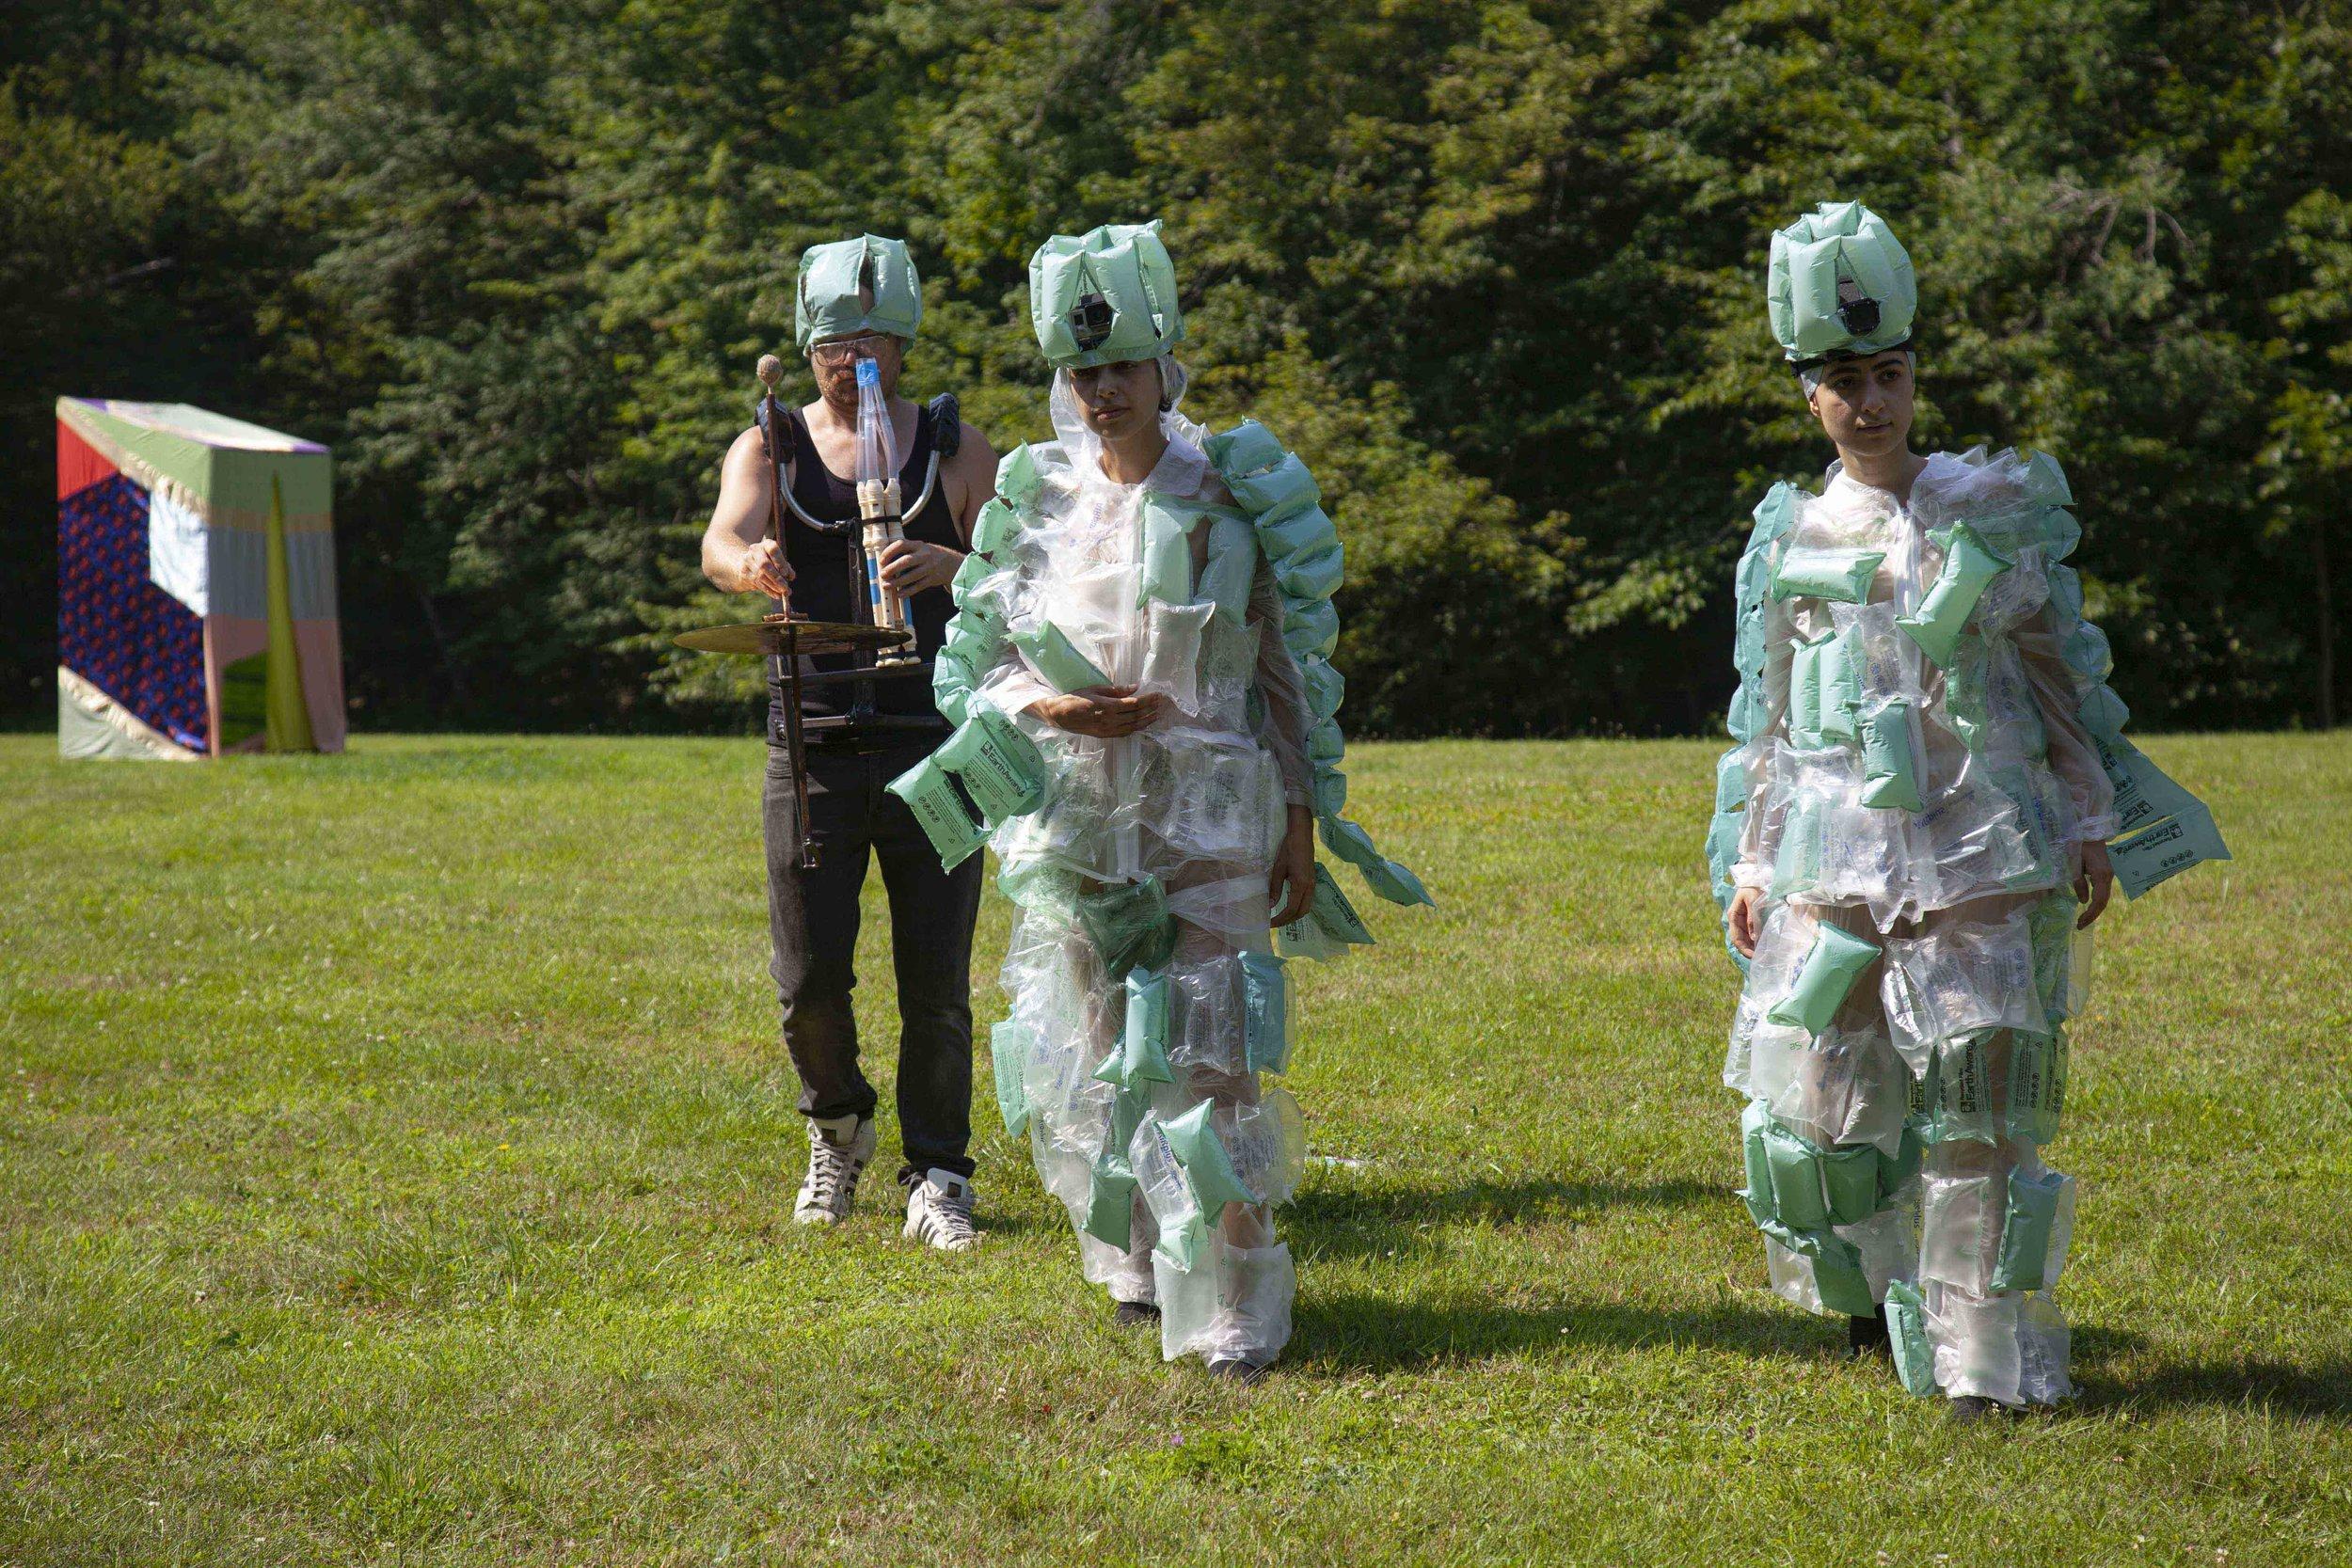 5. Fissure in the Air, Performance 1, 2018, Bahareh Khoshooee, Sareh Imani, Billy Dufala.jpg